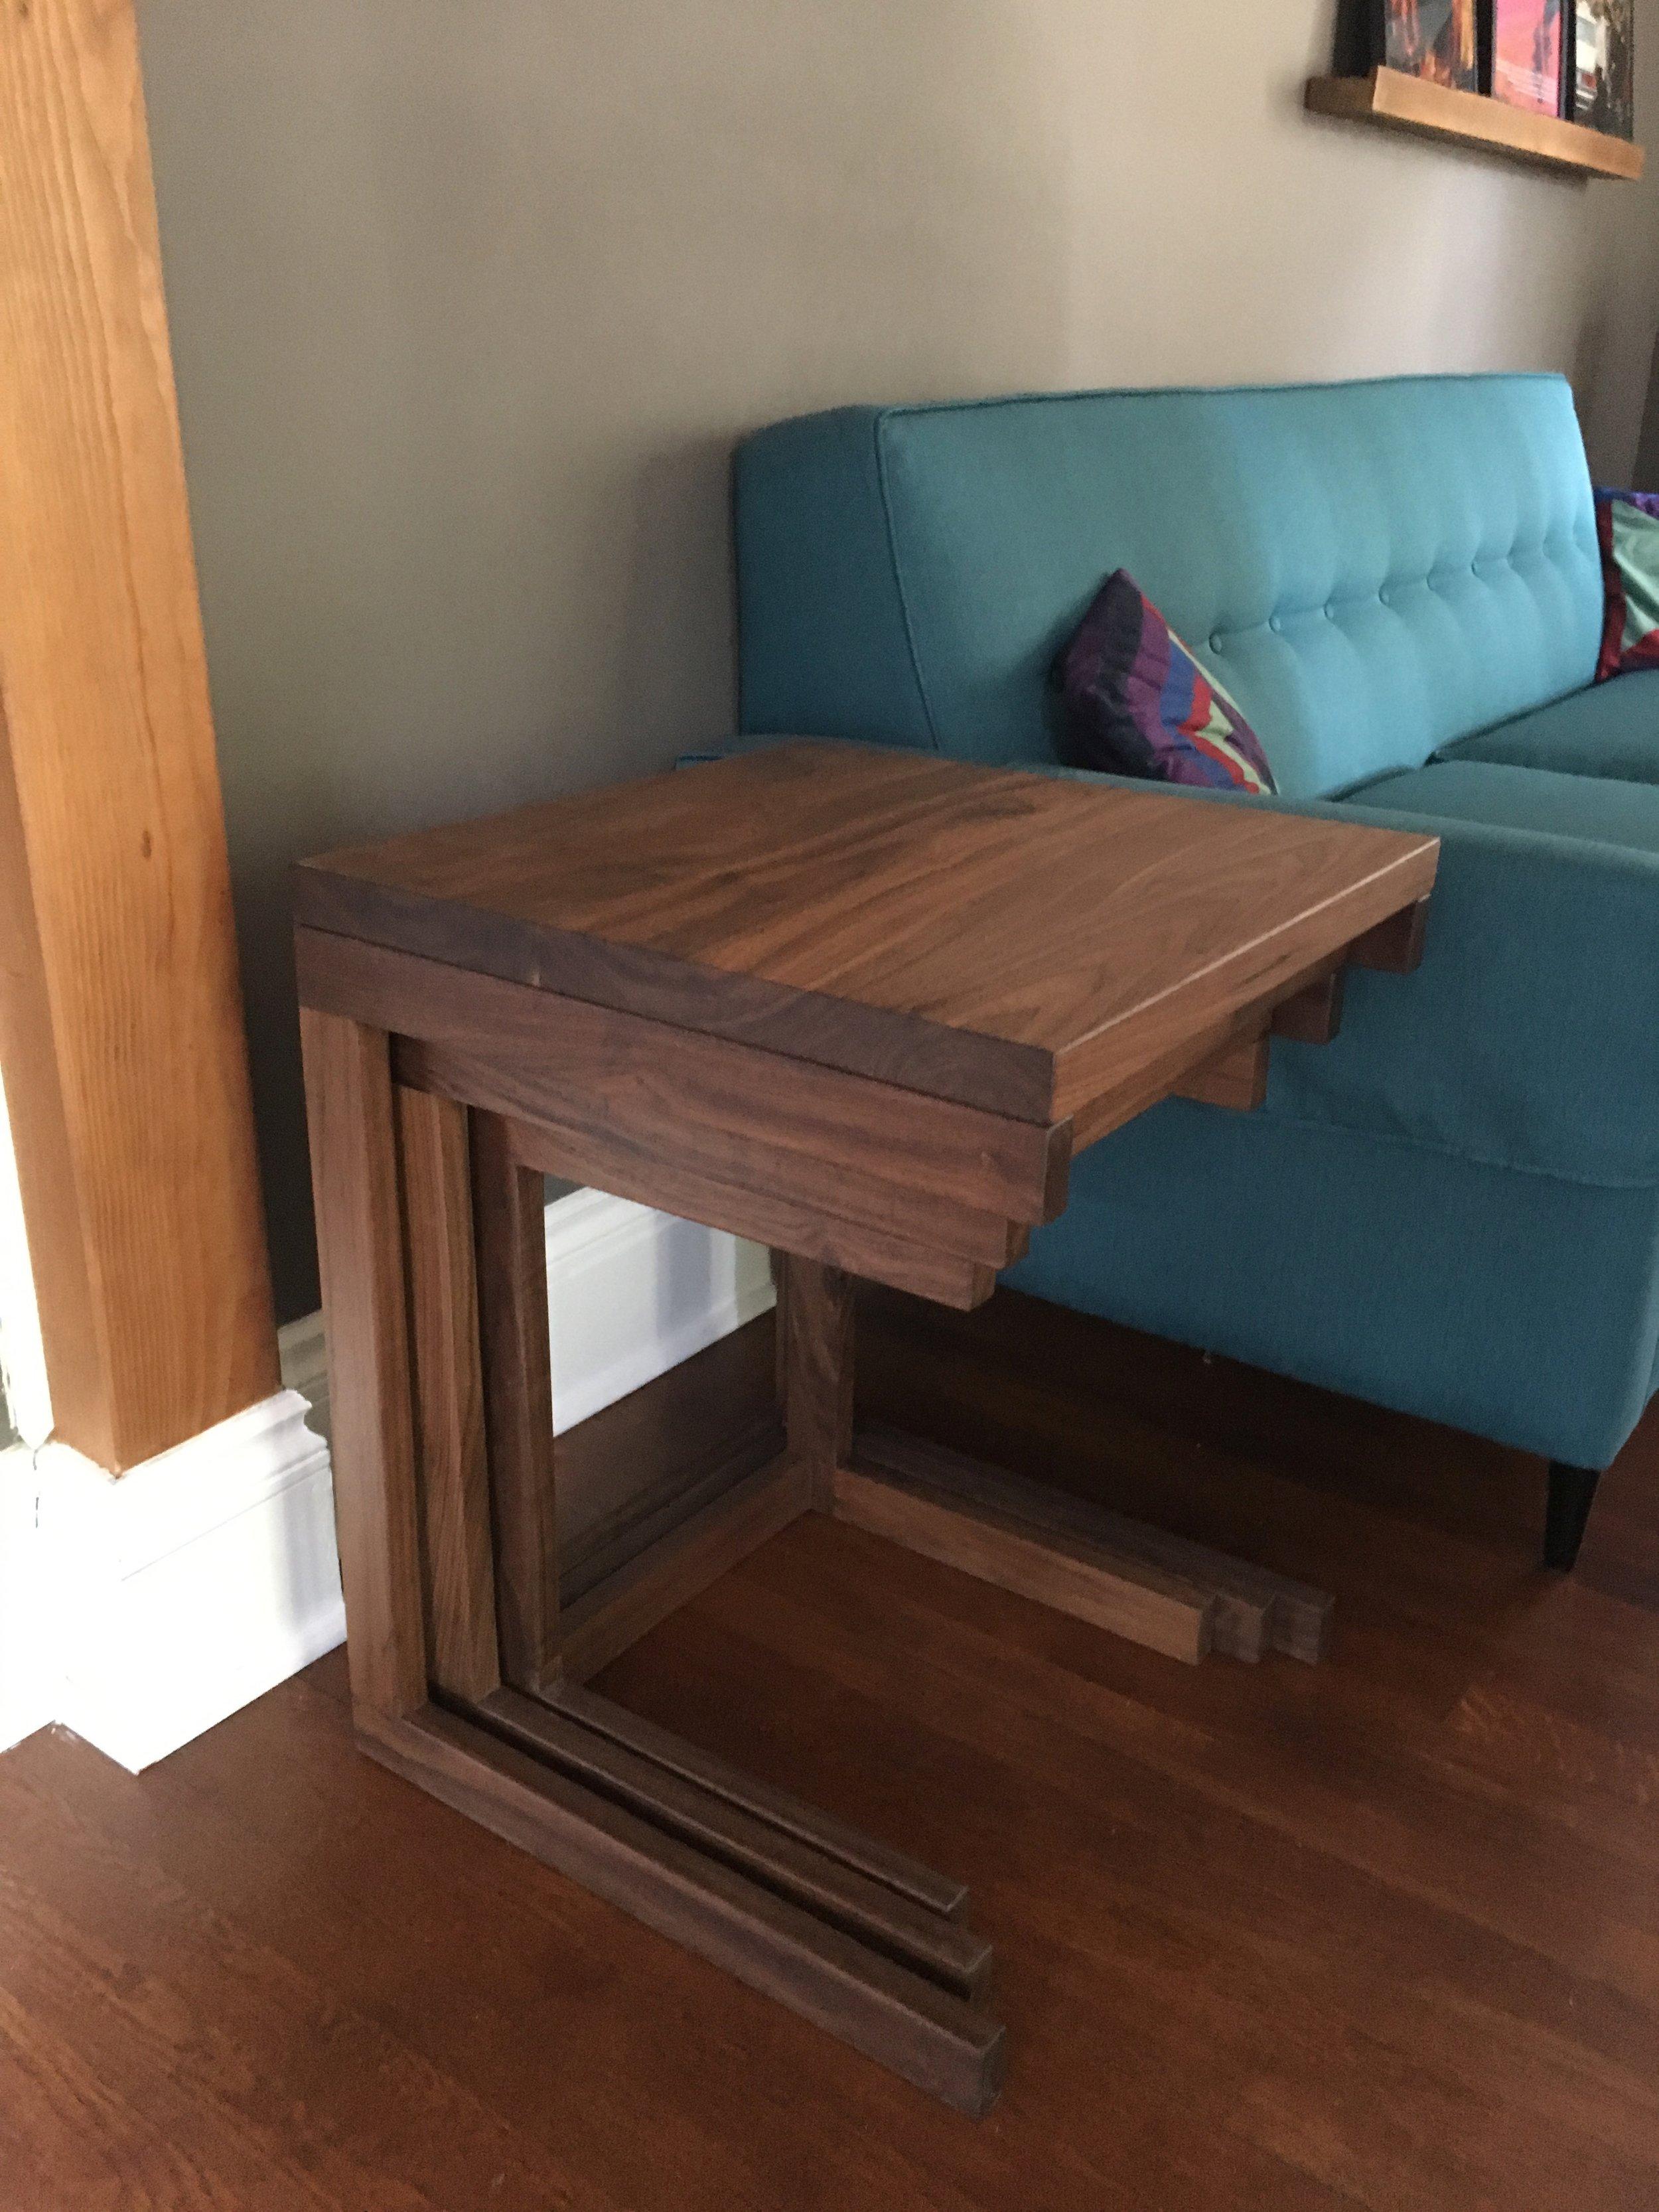 Walnut nesting tables stacked